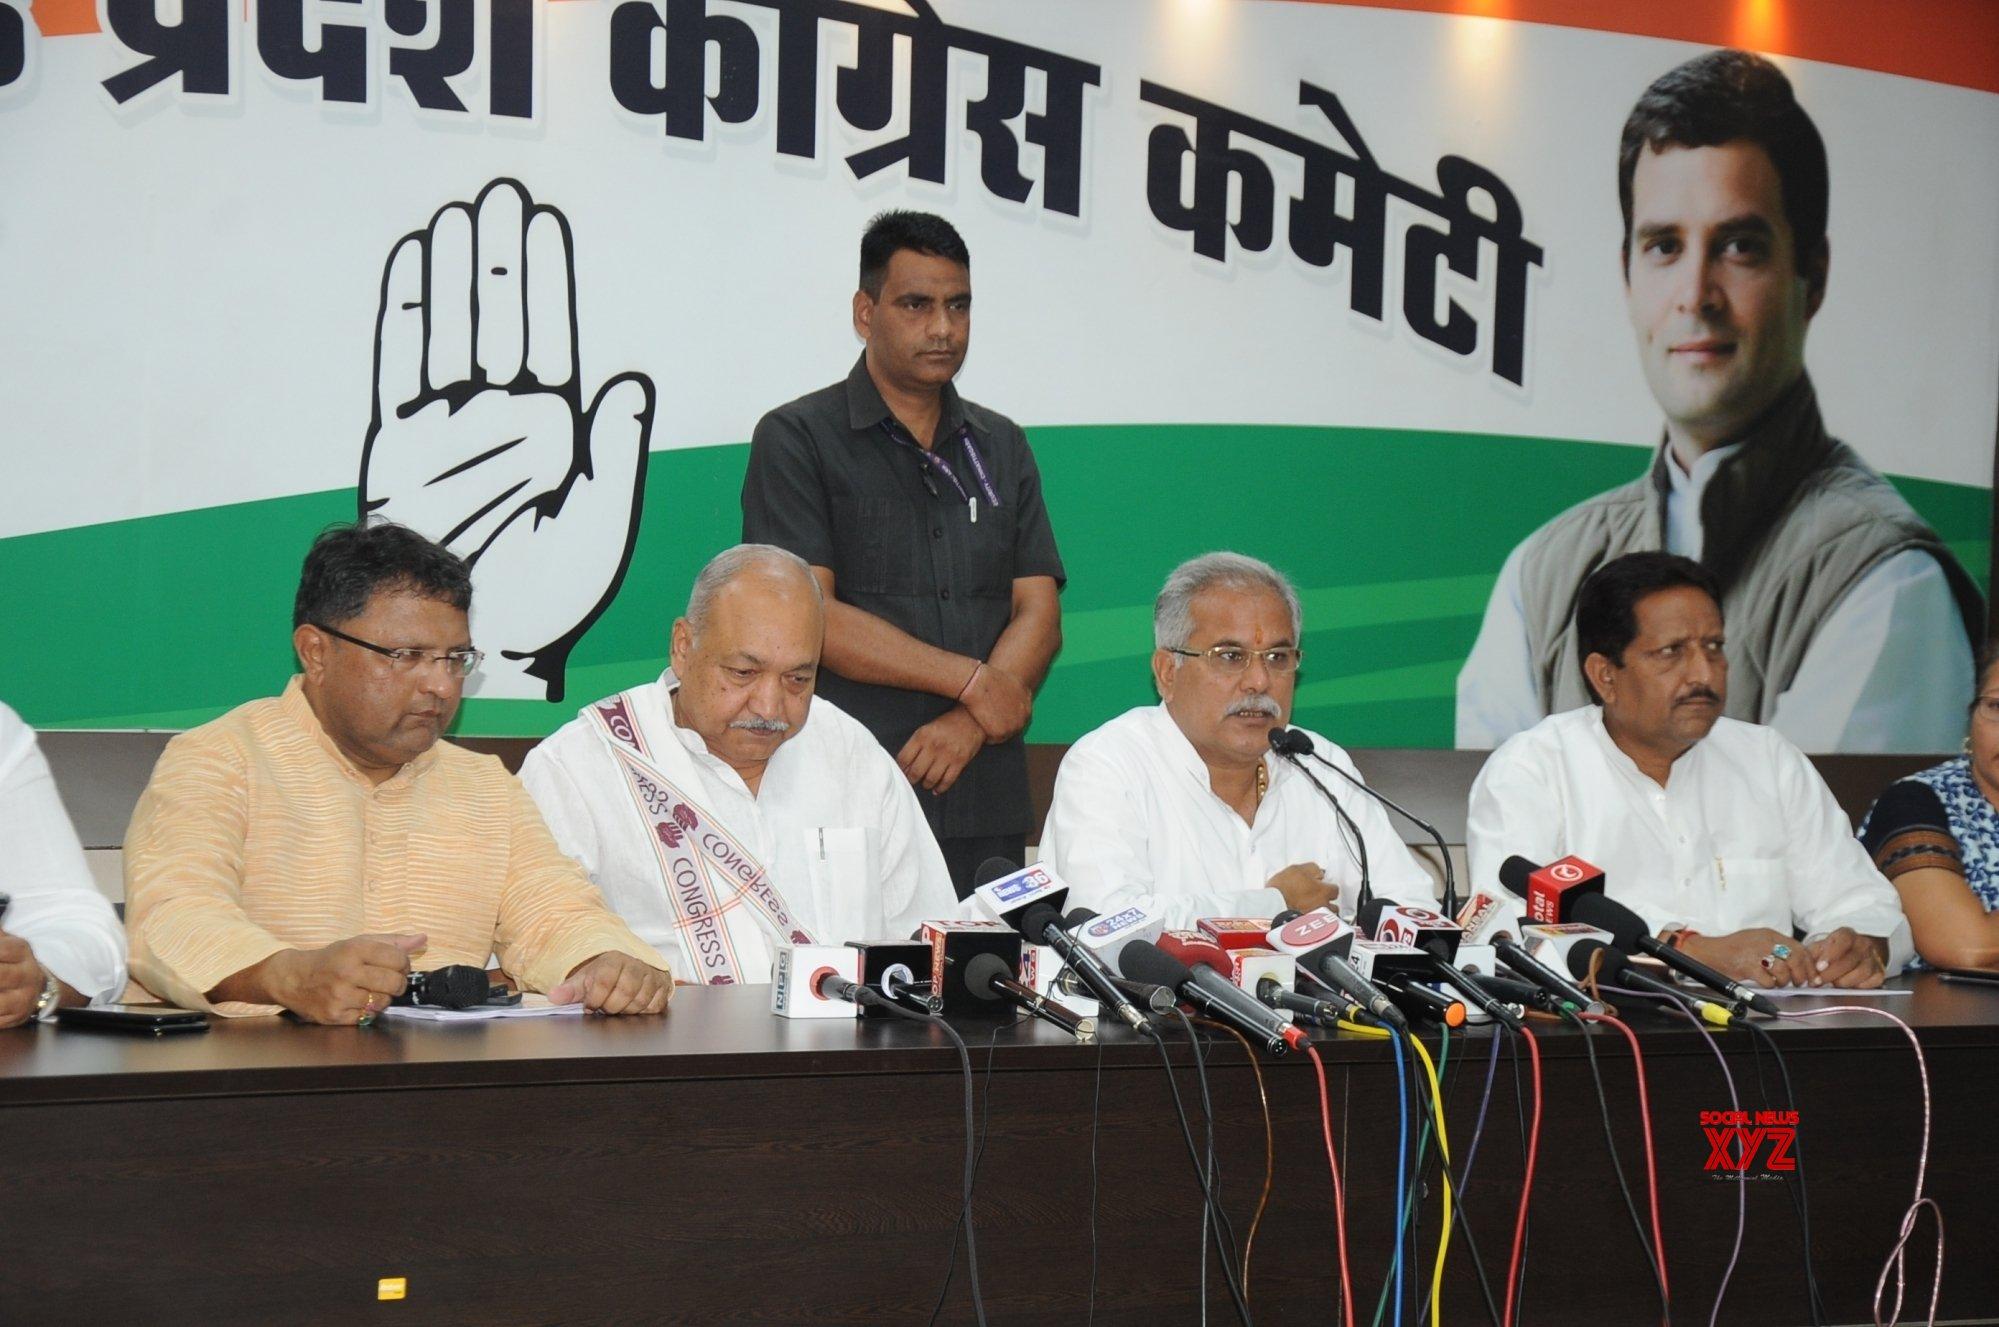 Raipur: Bhupesh Baghel's press conference #Gallery